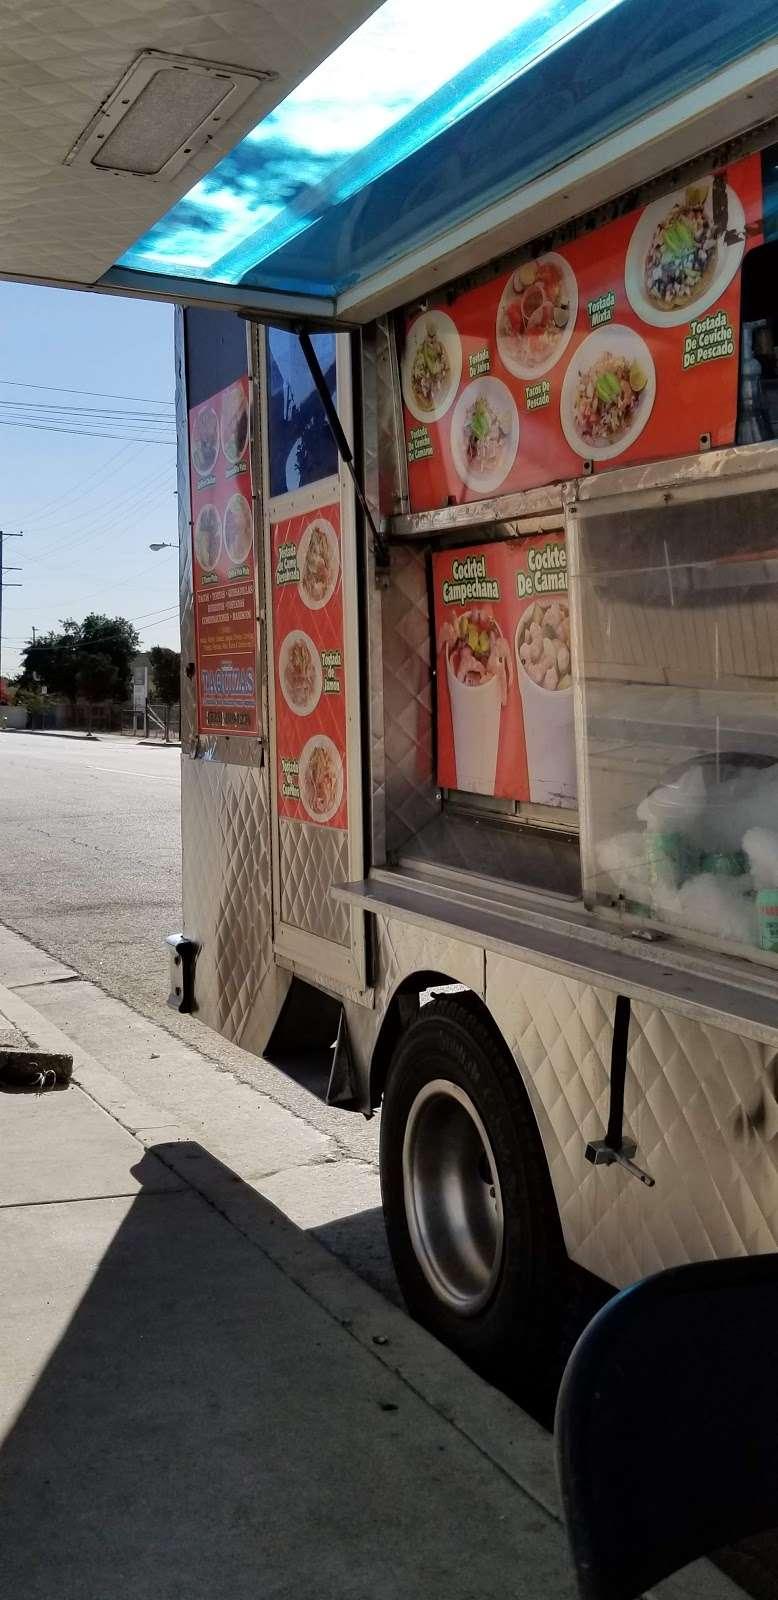 Tacos Y Mariscos Vicky - restaurant  | Photo 1 of 3 | Address: 15328 San Pedro St, Gardena, CA 90248, USA | Phone: (323) 819-1274